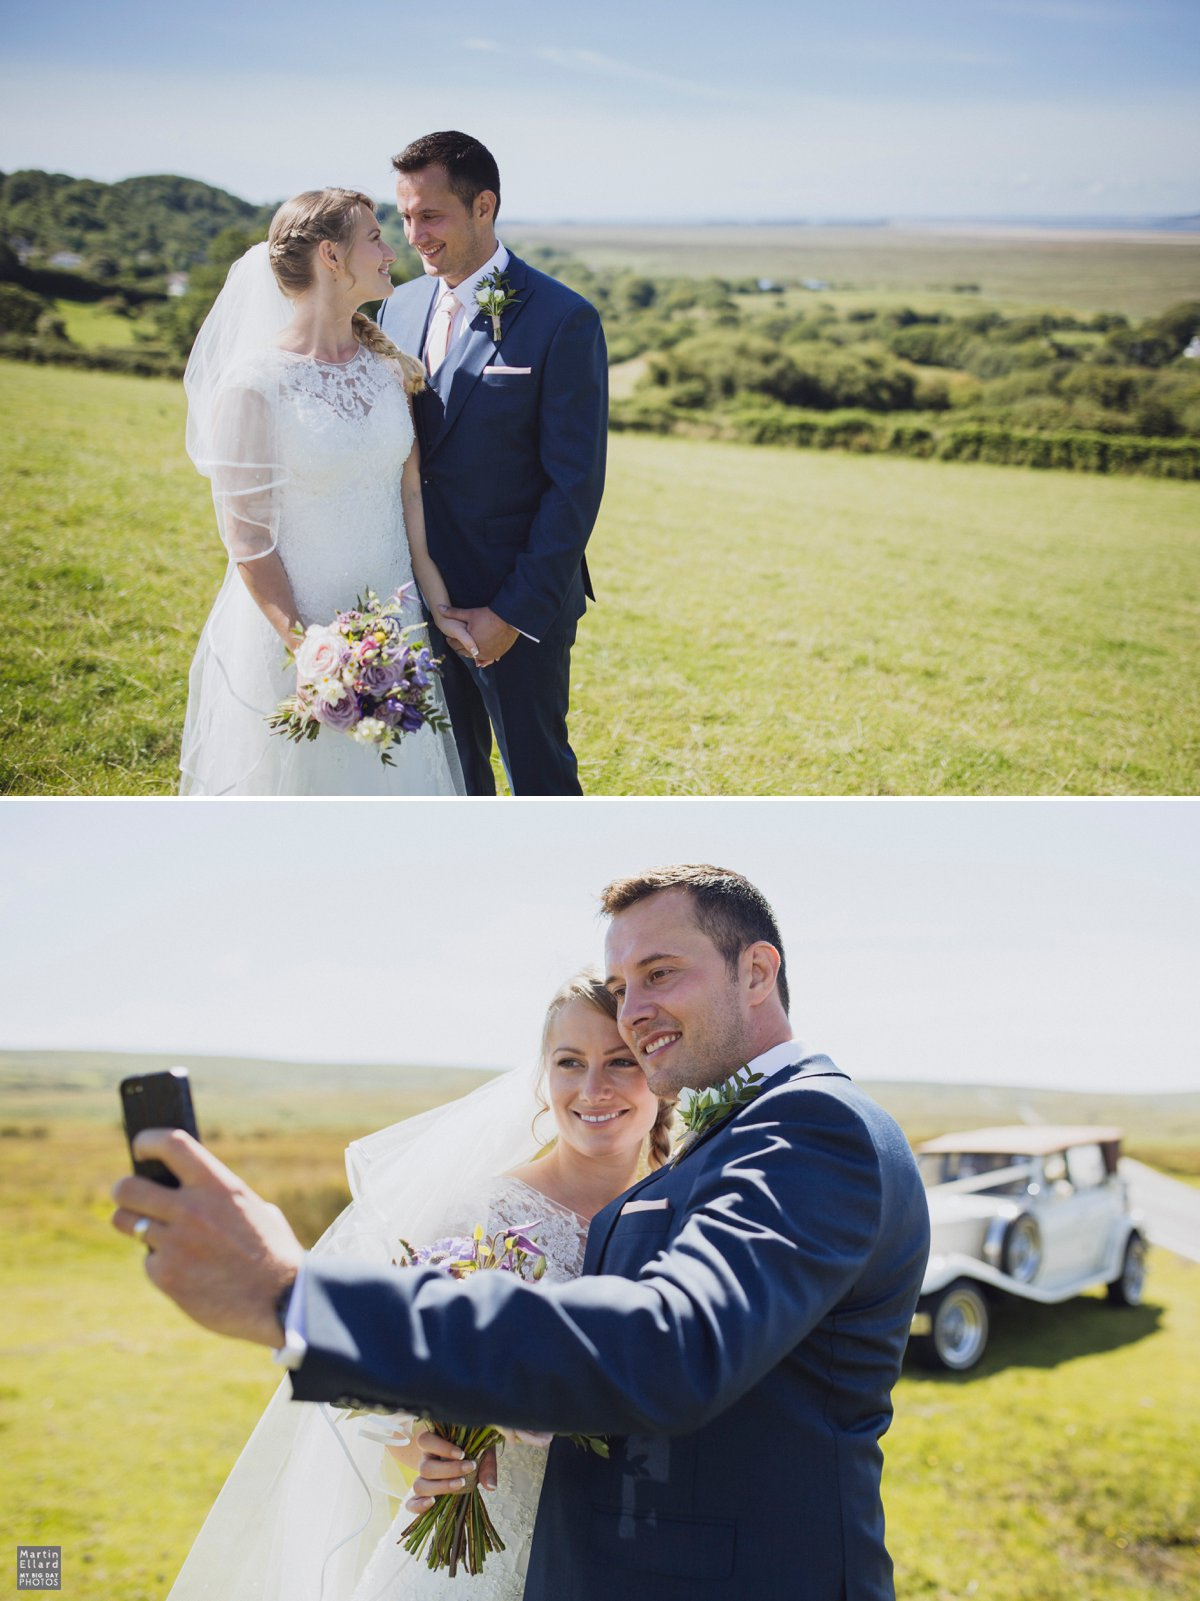 South Wales wedding photographer King Arthur Hotel weddings Gower Swansea Cardiff UK